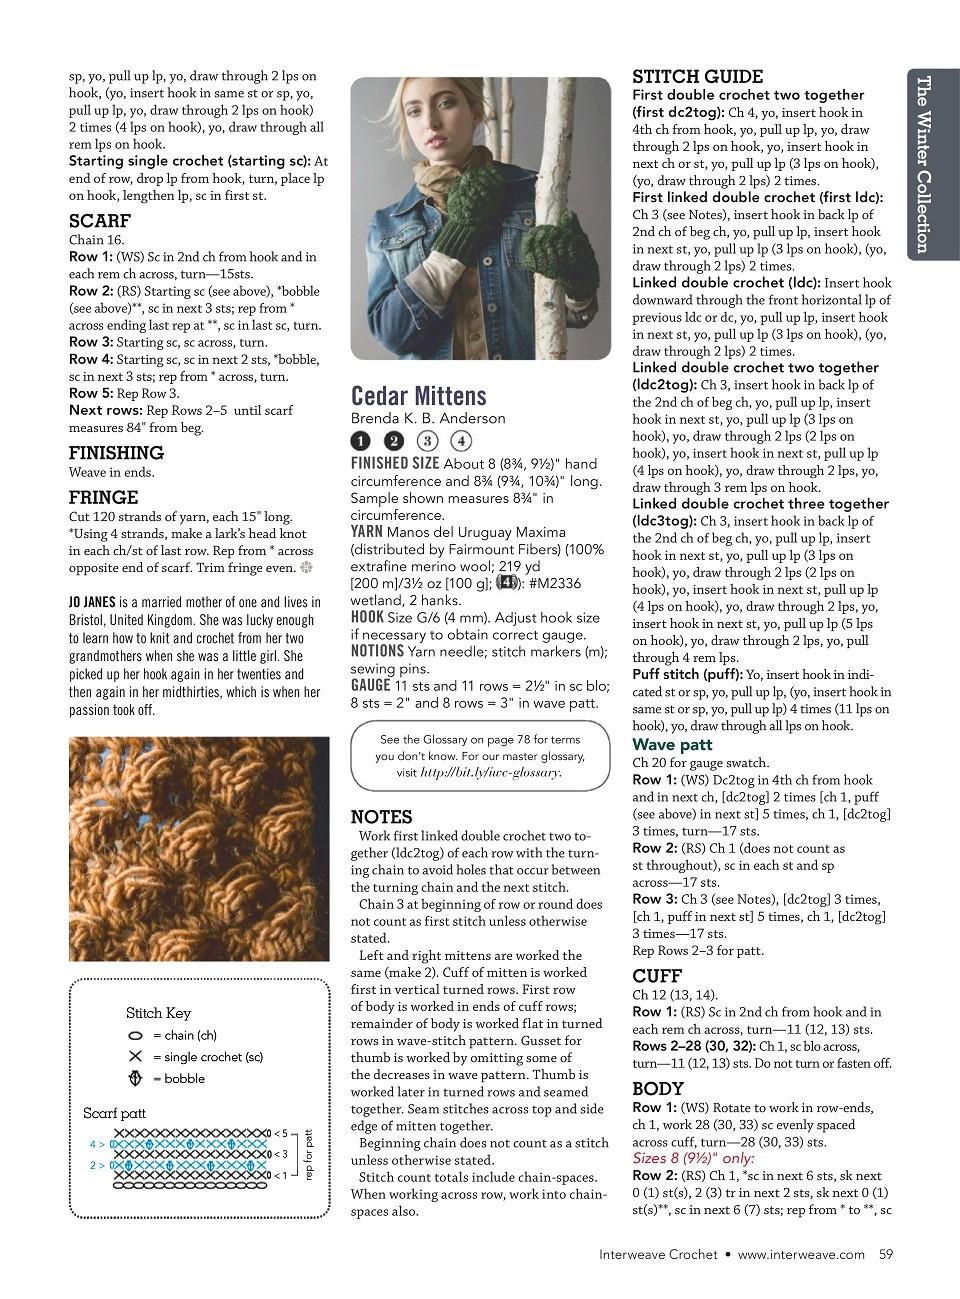 Interweave Crochet Winter 2019-60